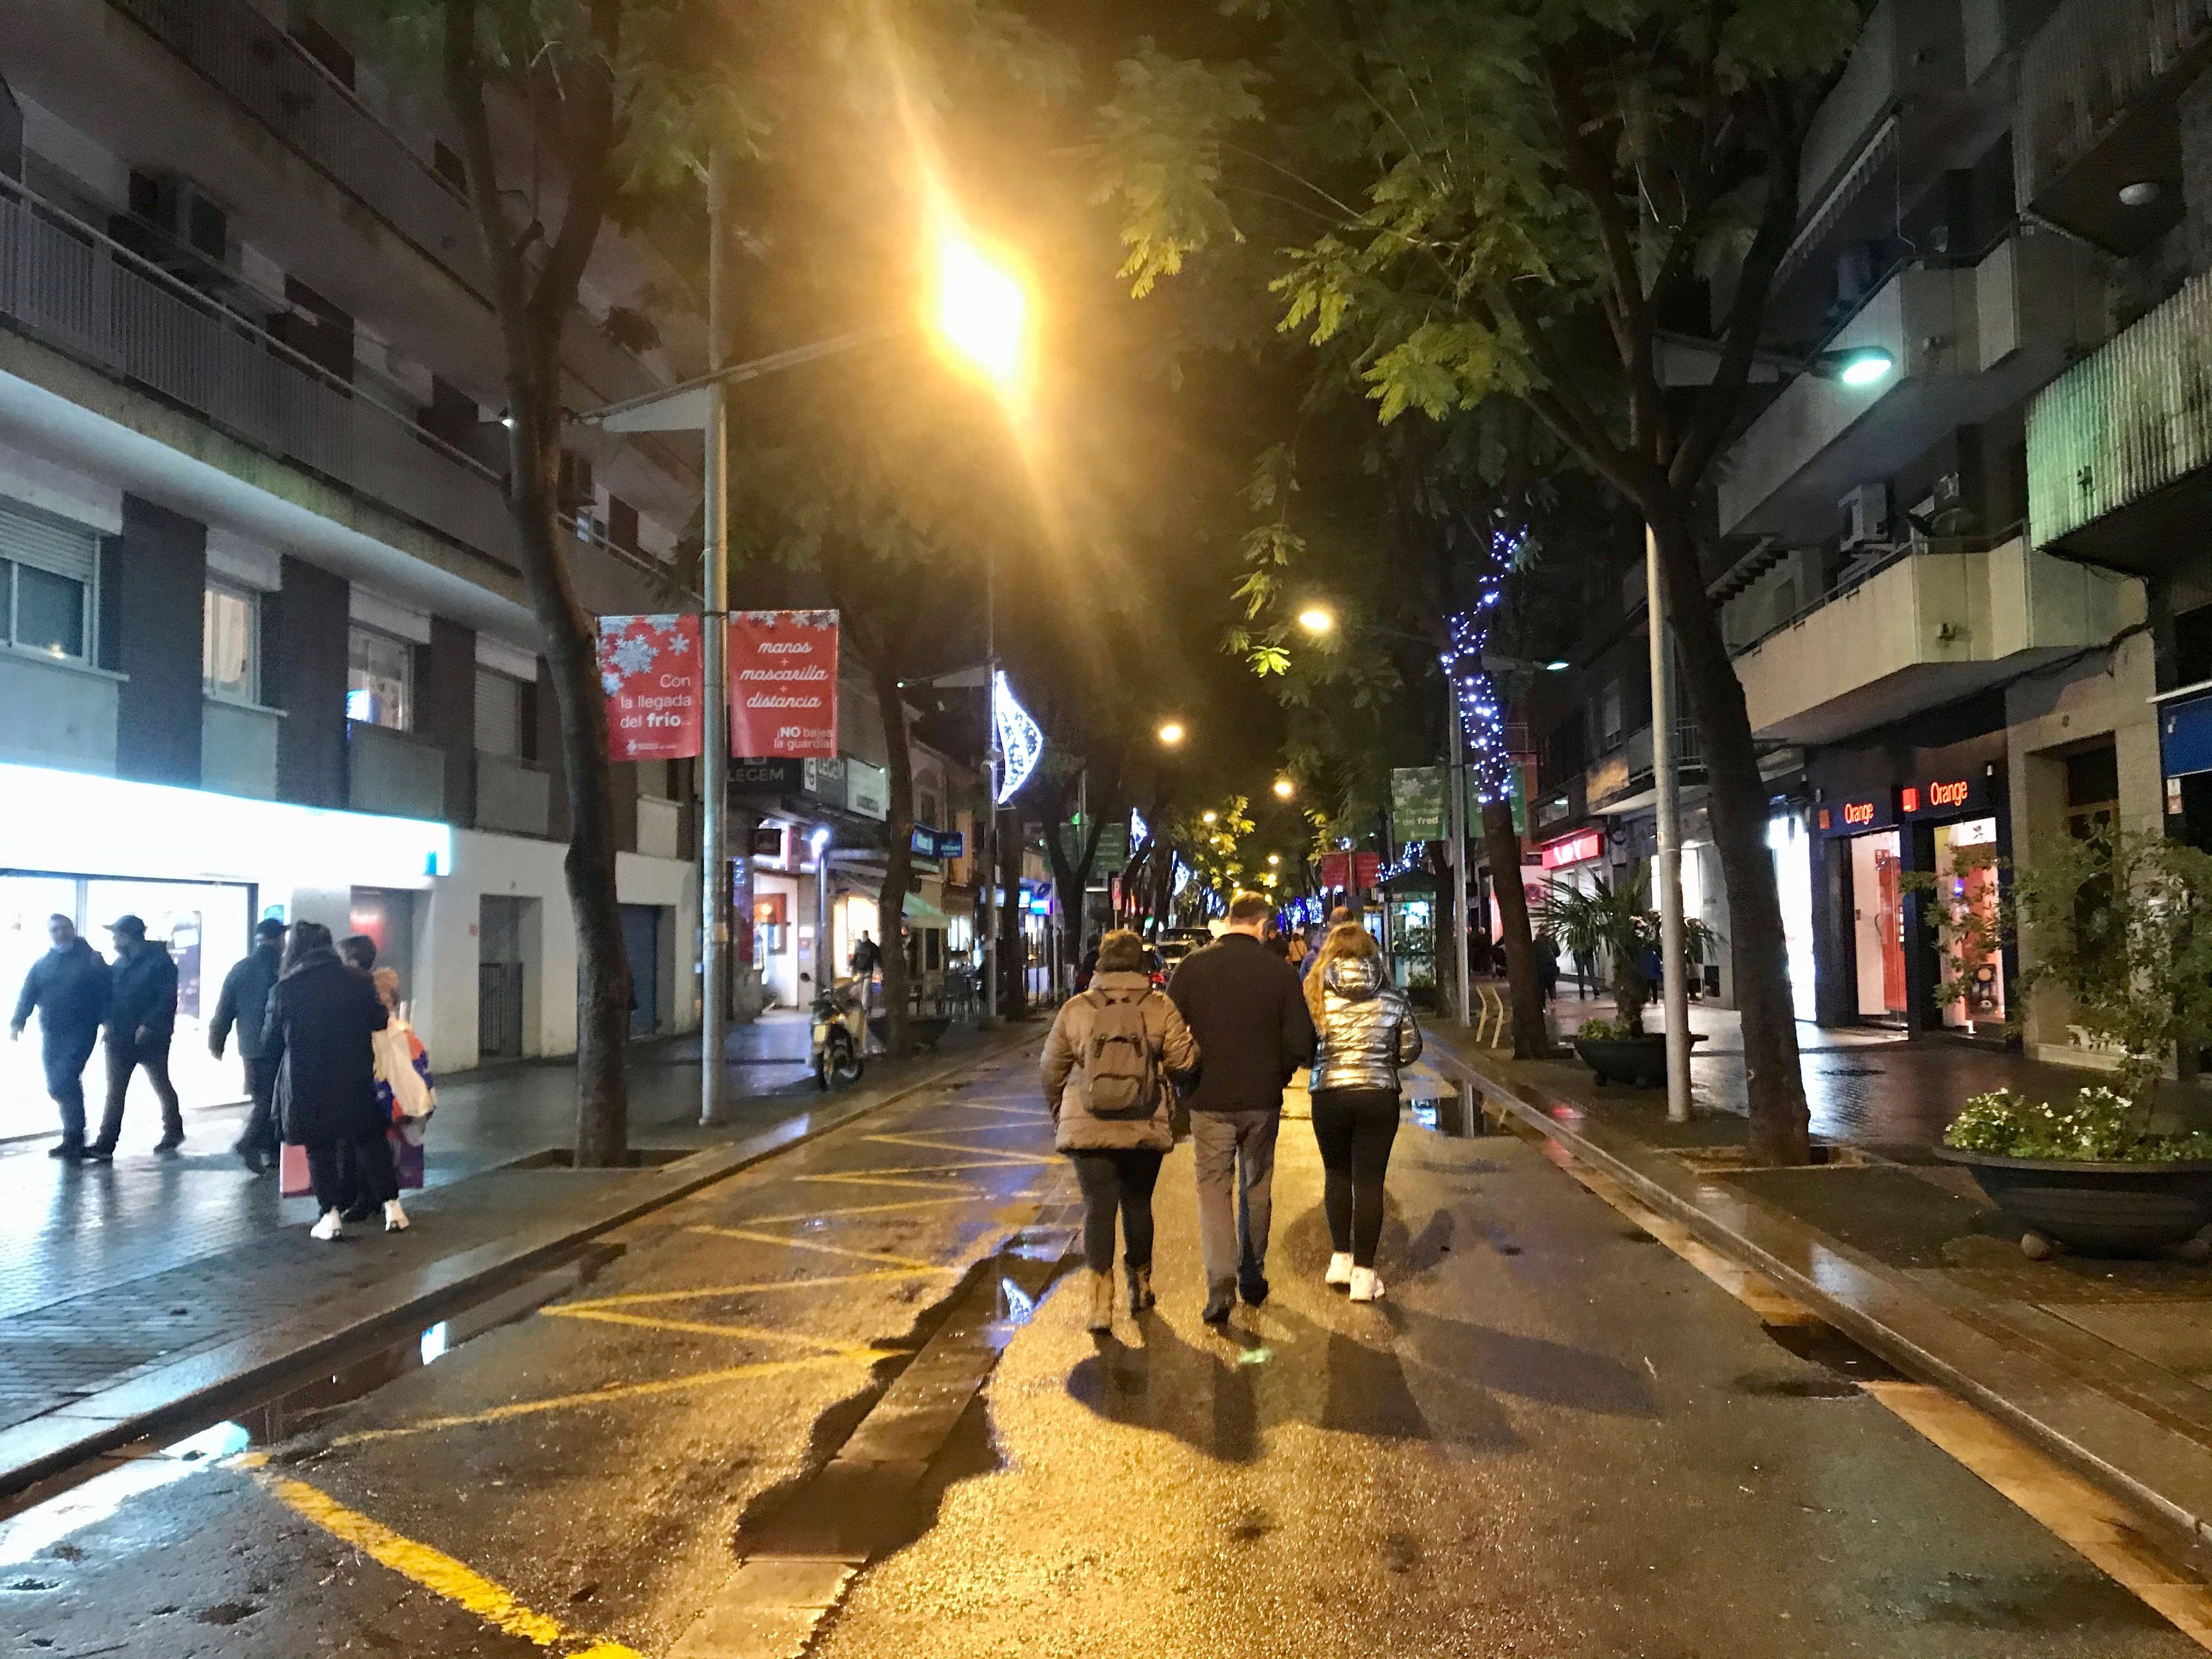 Avinguda de Catalunya